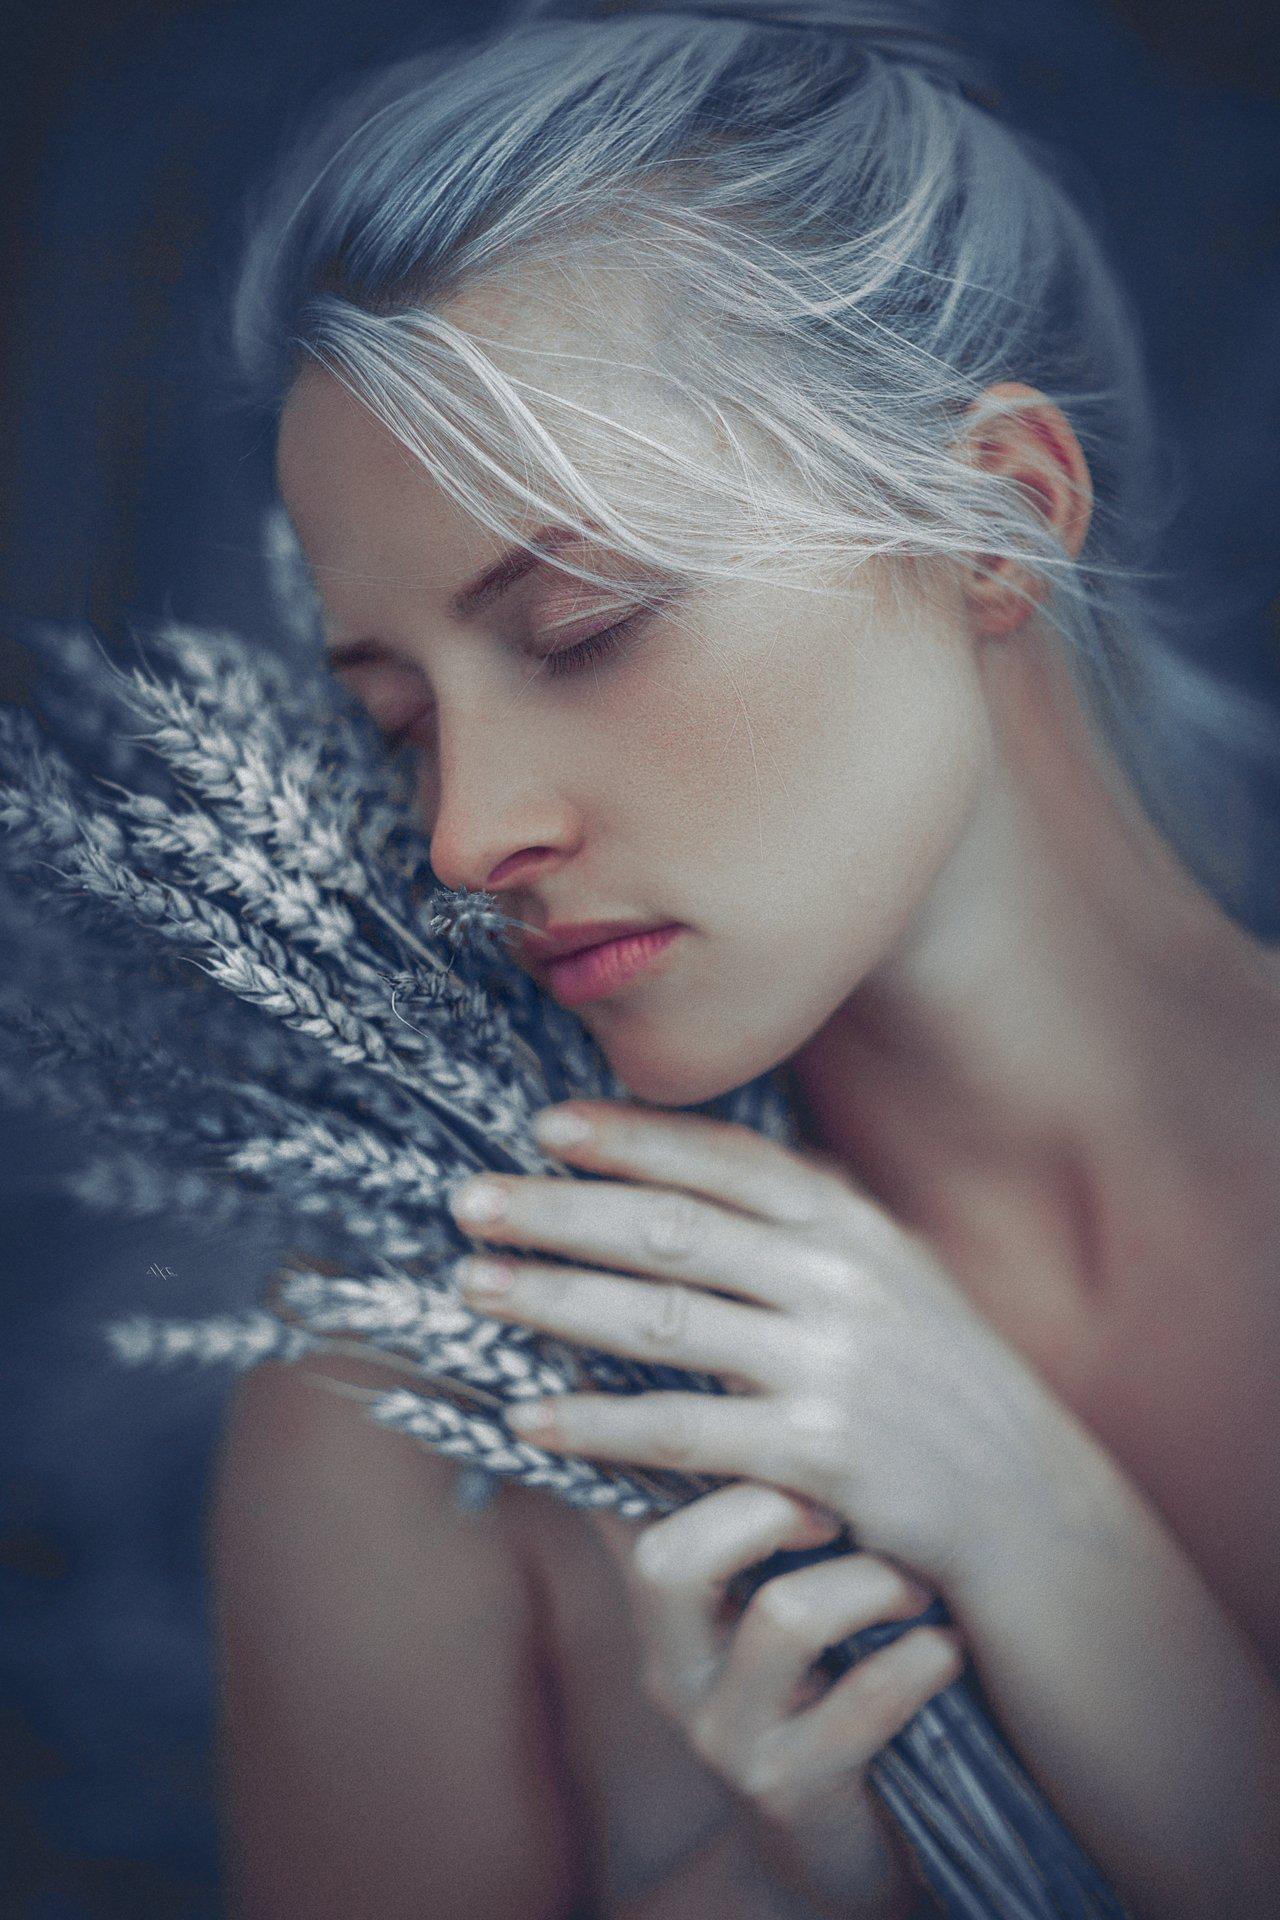 woman, portrait, nature, toning, blonde, wheat, mood, Руслан Болгов (Axe)